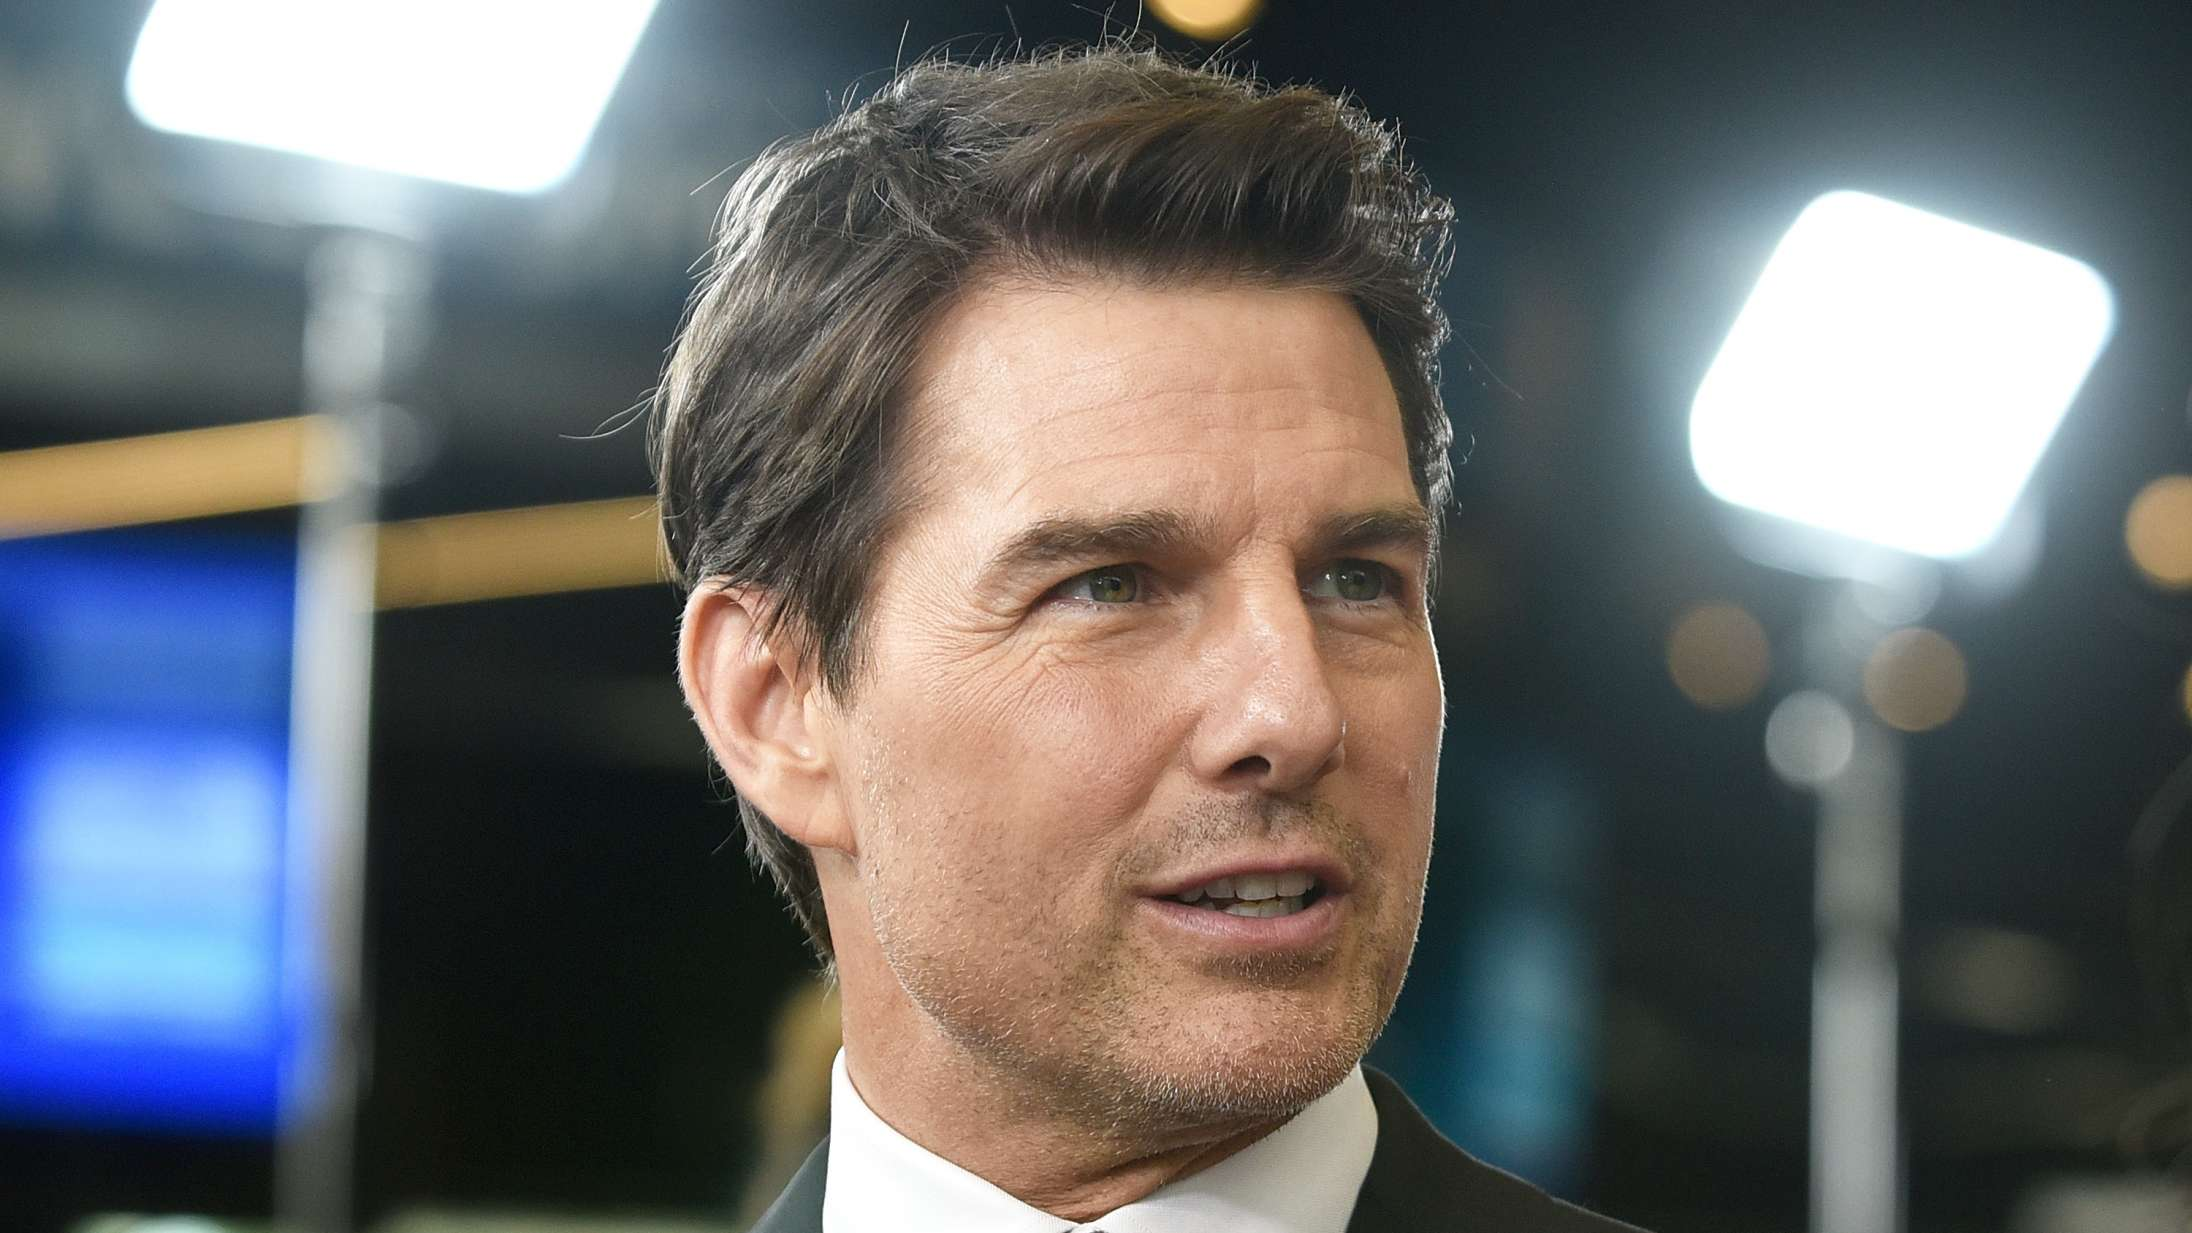 Tom Cruise reddede skuespilkollega fra den visse død under filmoptagelser